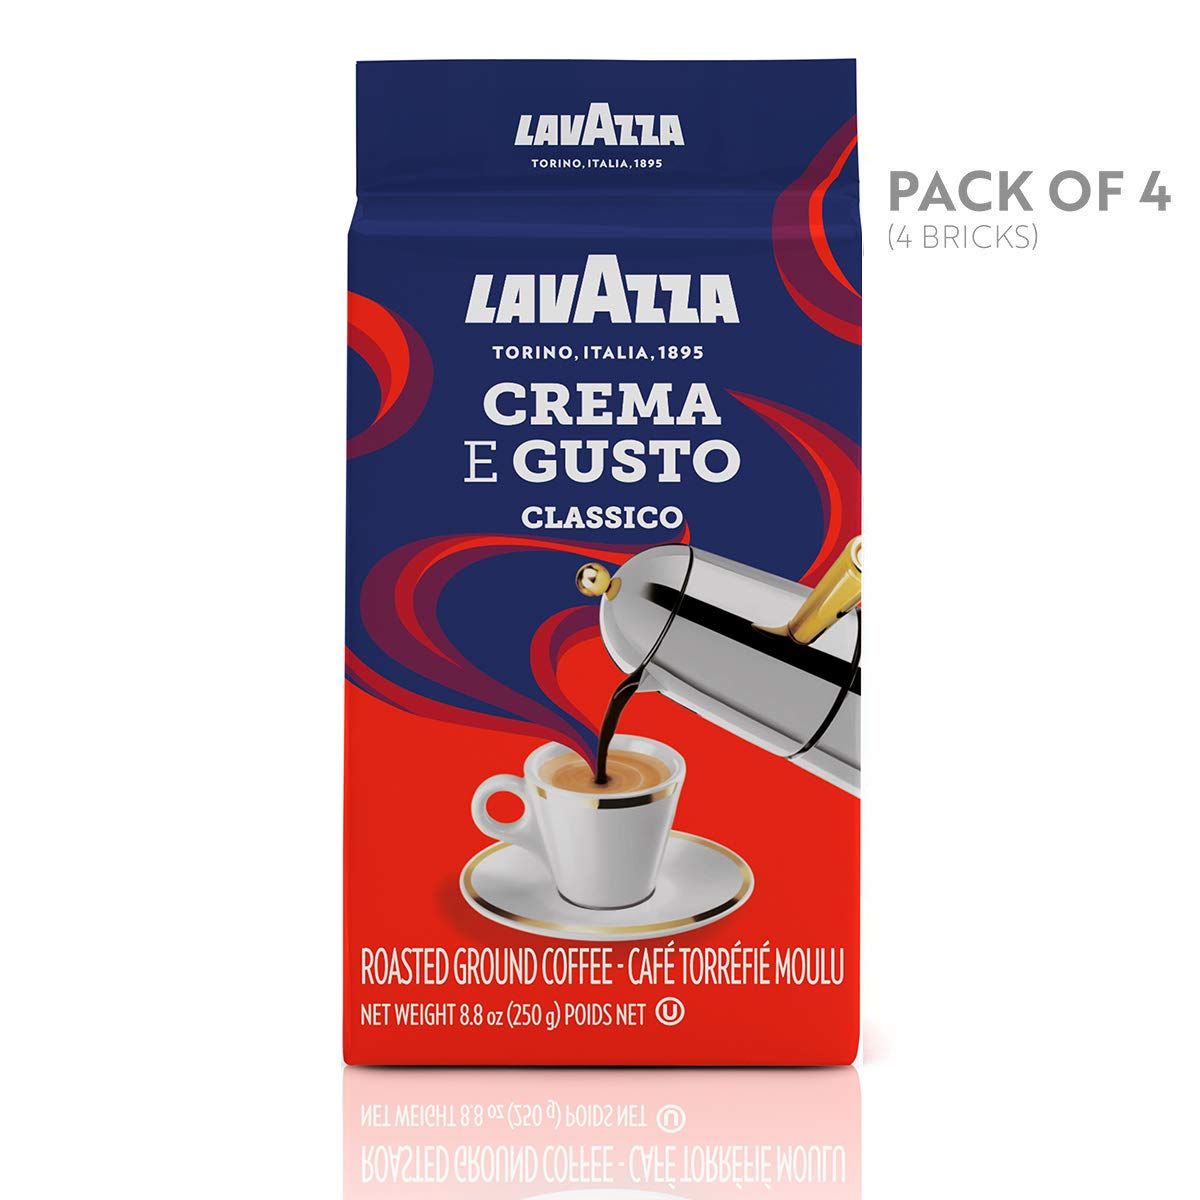 Lavazza Crema e Gusto Ground Coffee Blend, Espresso Dark Roast, 8.8-Ounce Bags (Pack of 4).